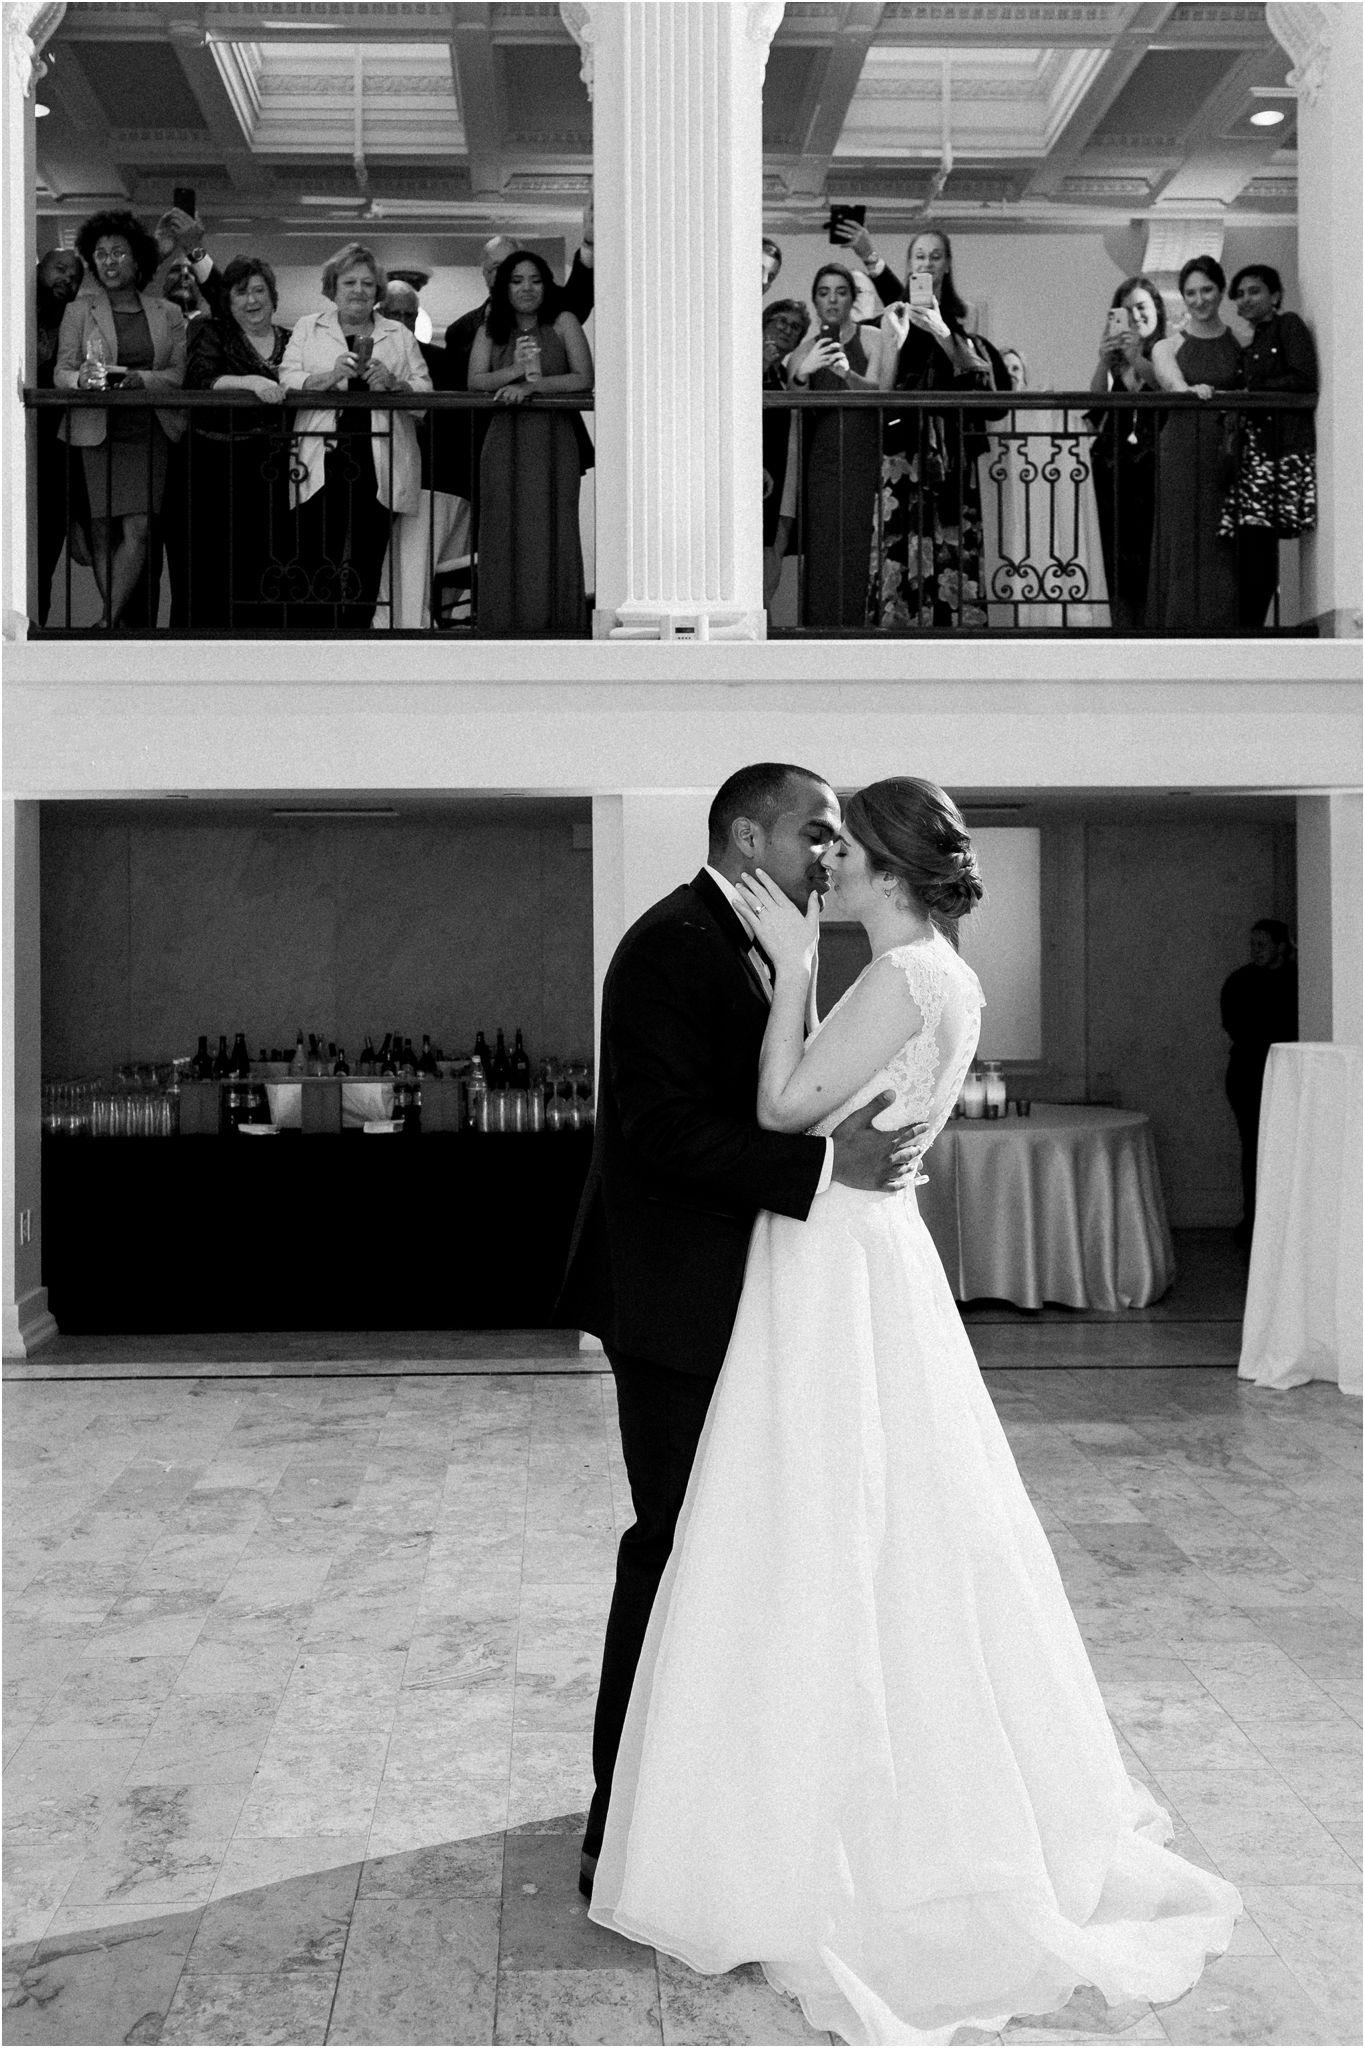 providence-public-library-wedding-images_00041.JPG